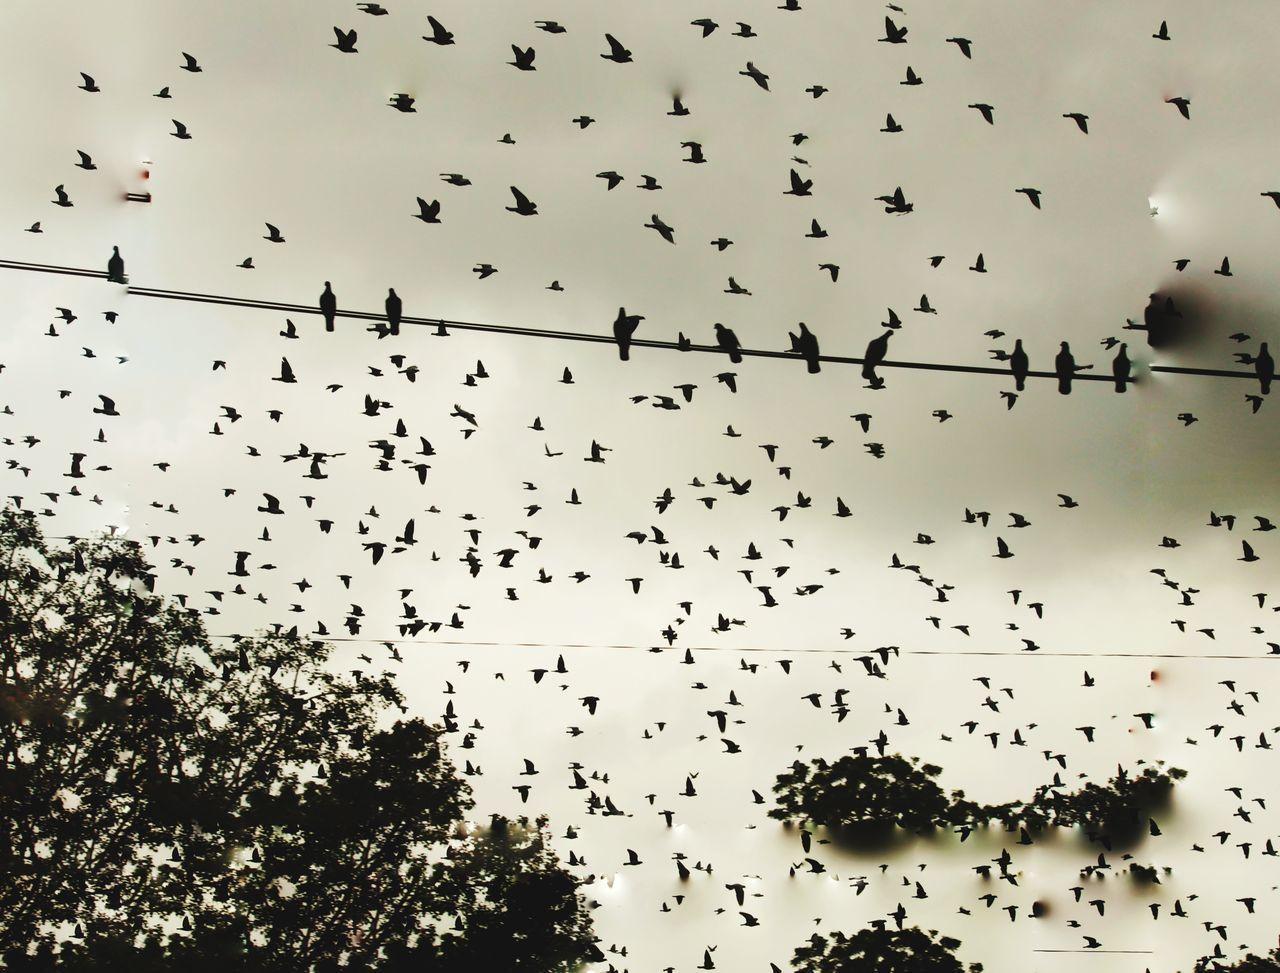 Migrating Birds Birdingphotography Canonphotography Chaosbirds Naturestraffic Flock Of Birds EyeEmNewHere Canon500d😘 Jaipur Rajasthan